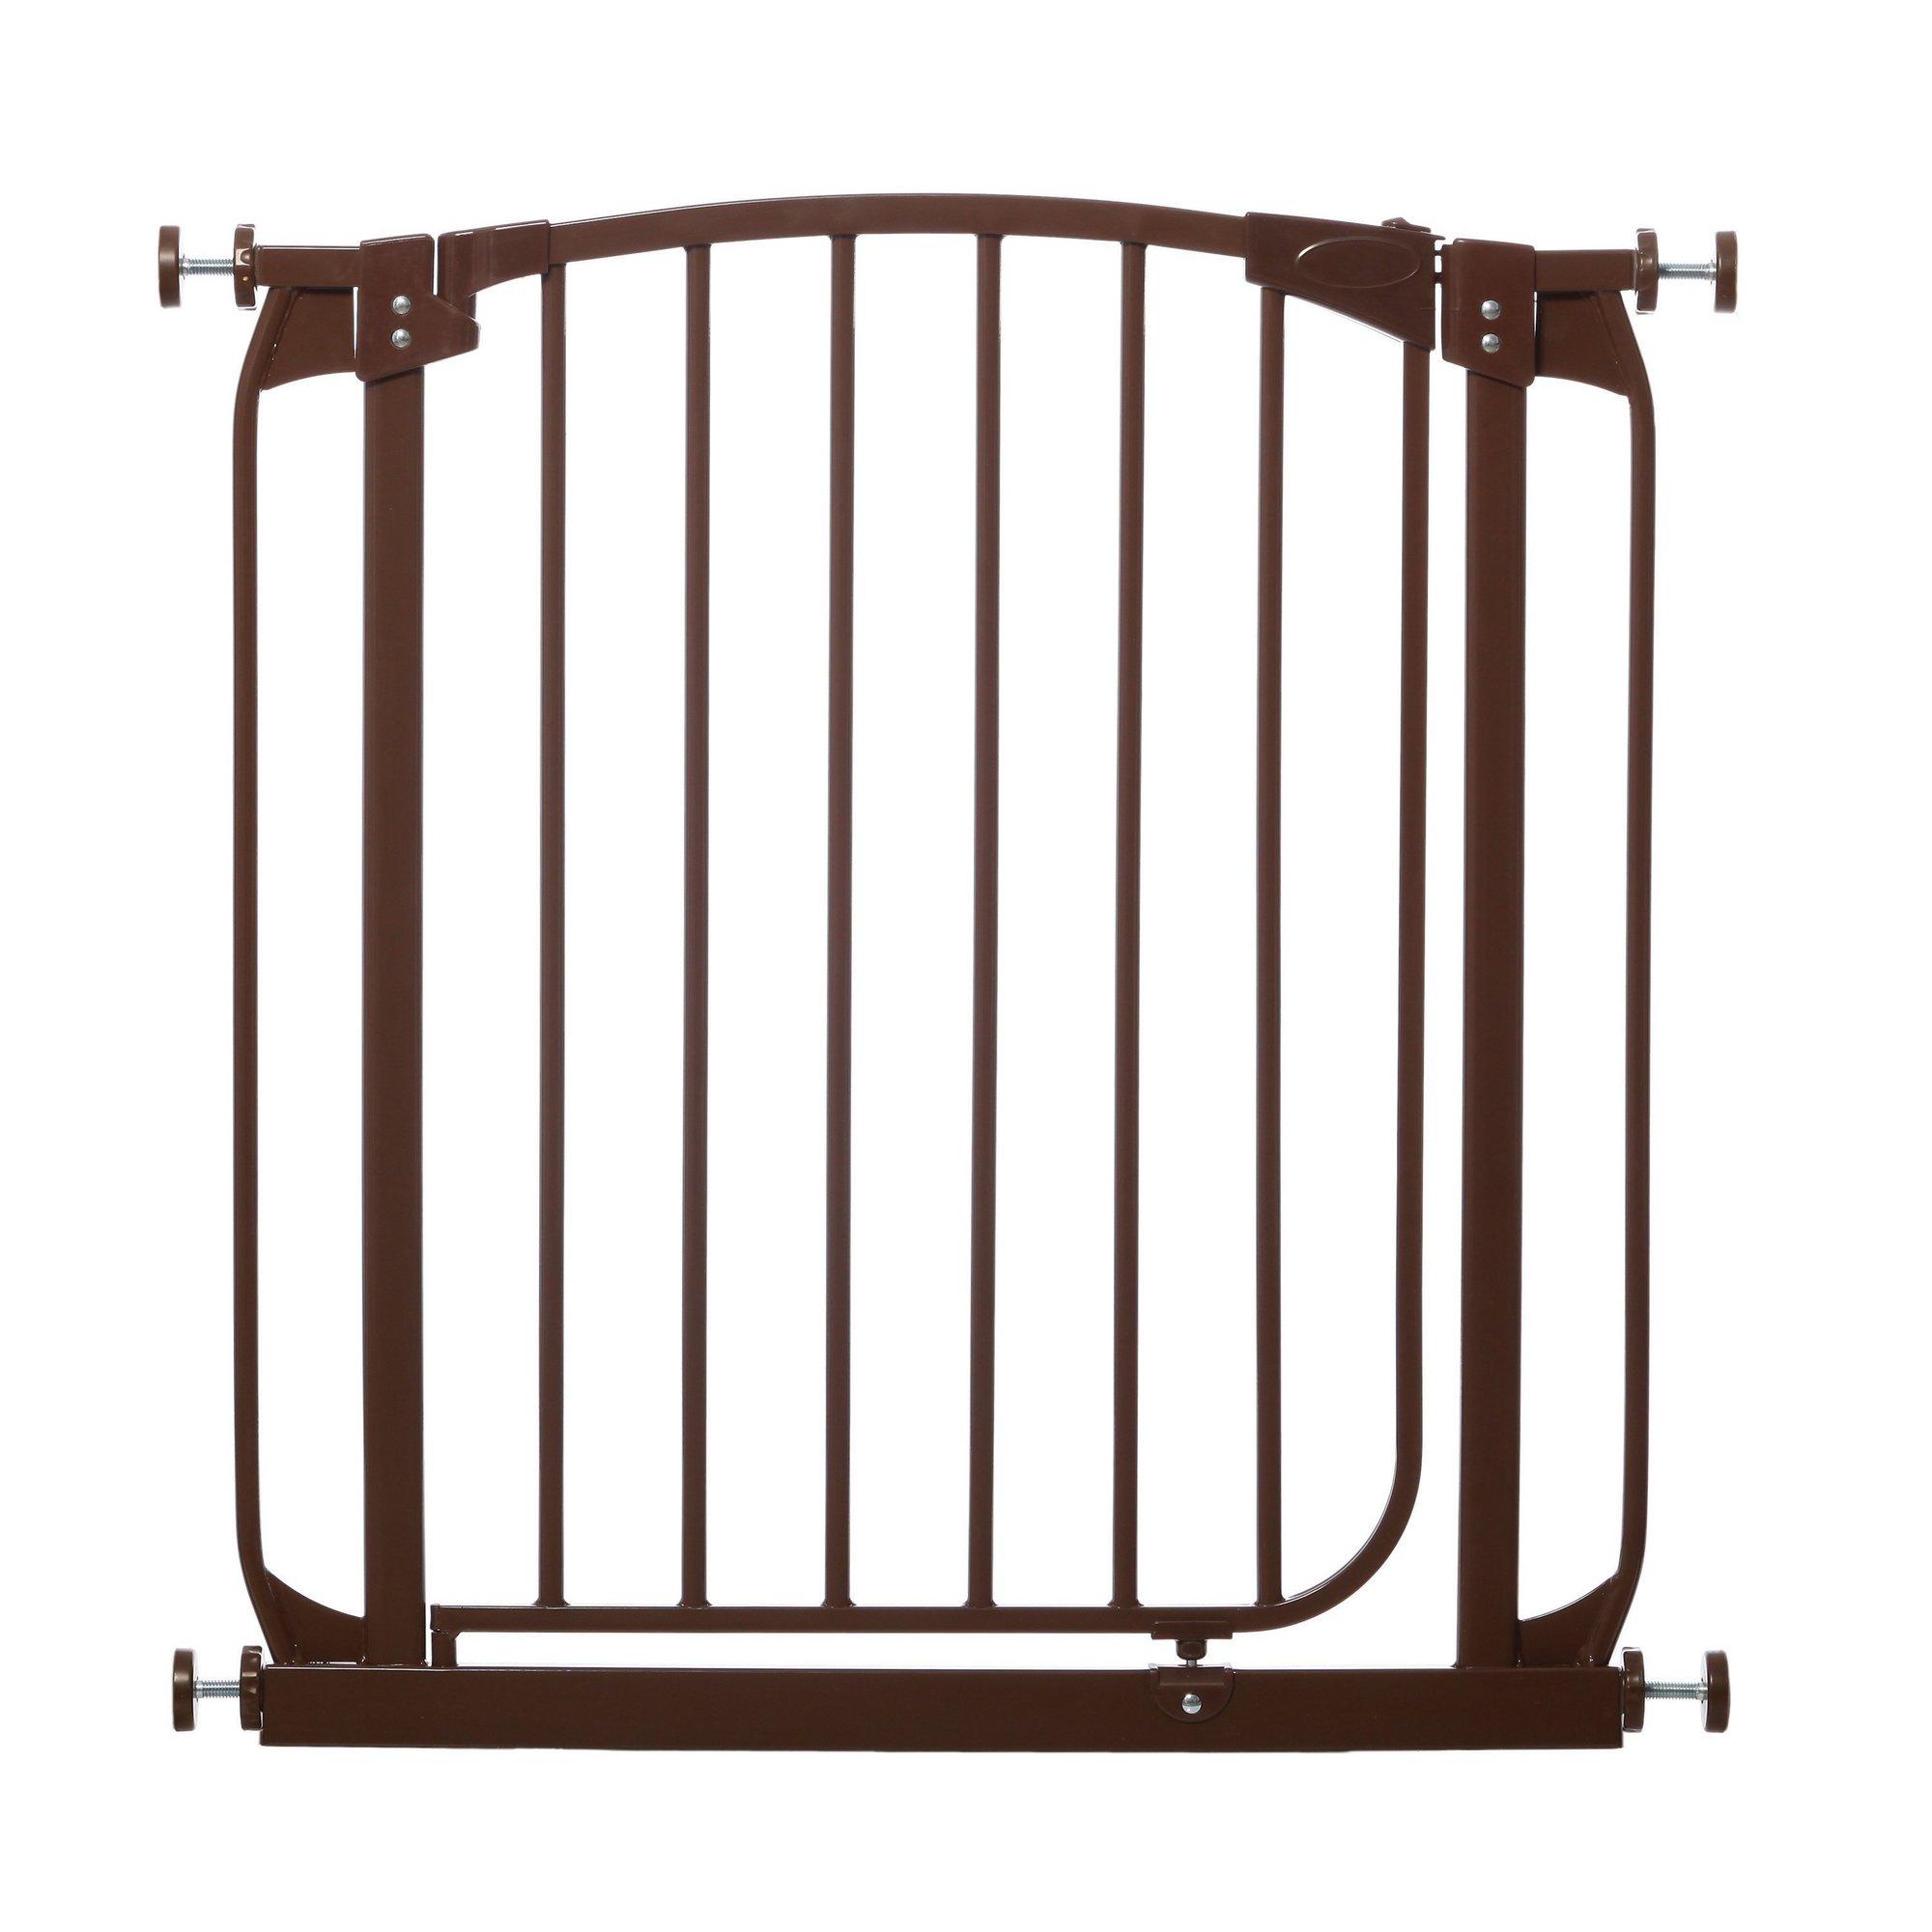 Image of Auto-Close Security Gate